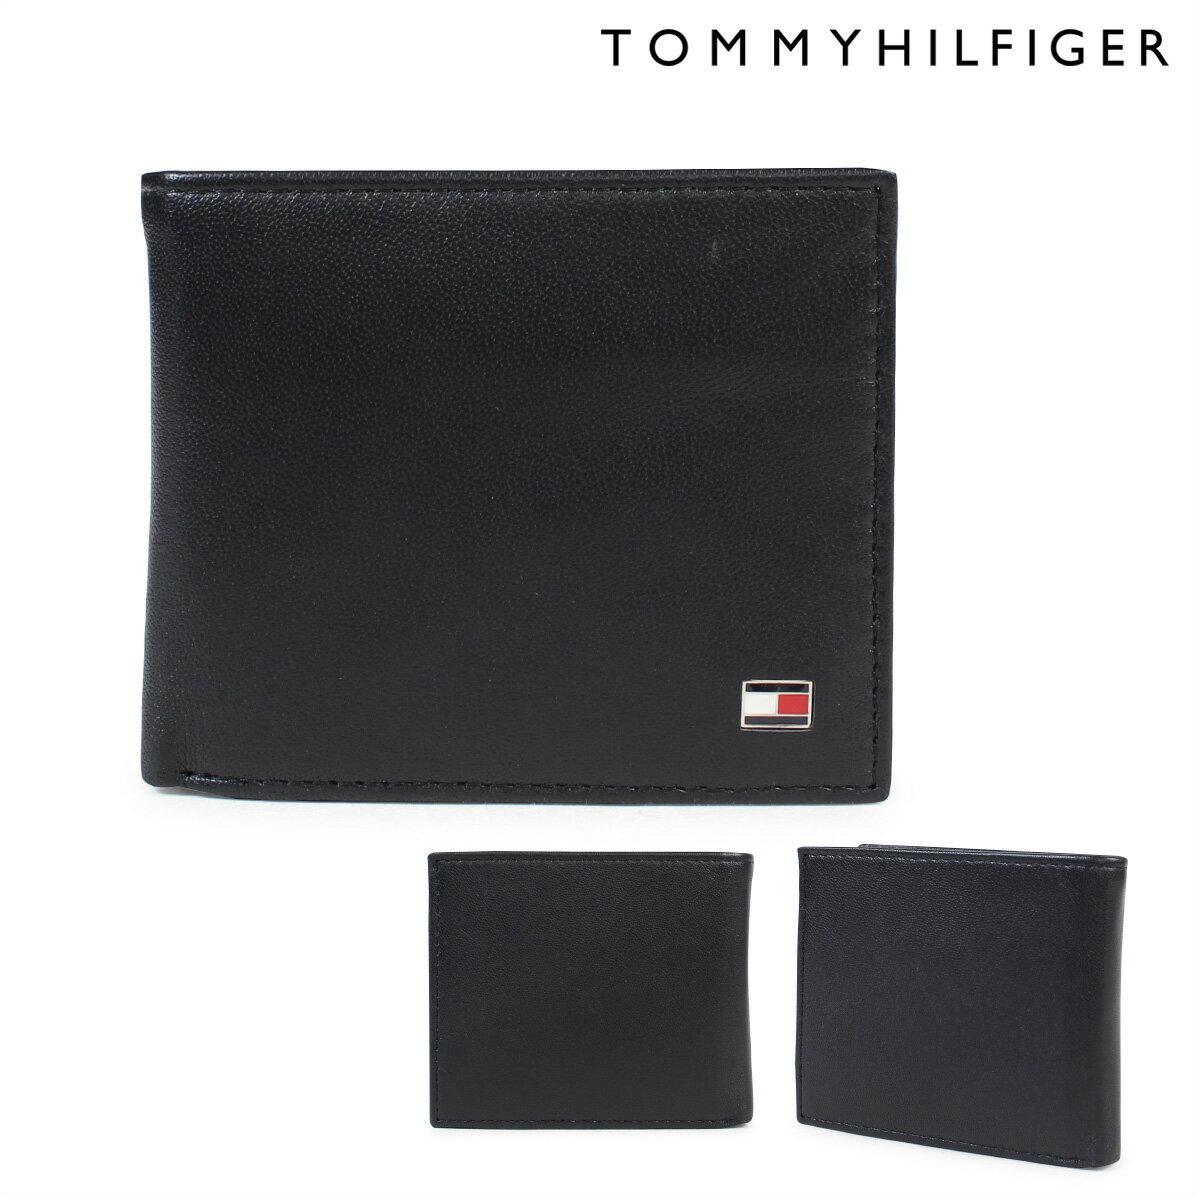 TOMMY HILFIGER 財布 トミーヒルフィガー 二つ折り財布 メンズ レザー OXFORD BI-FOLD WALLET 96-4511 31TL25X003 ブラック [6/12 追加入荷]